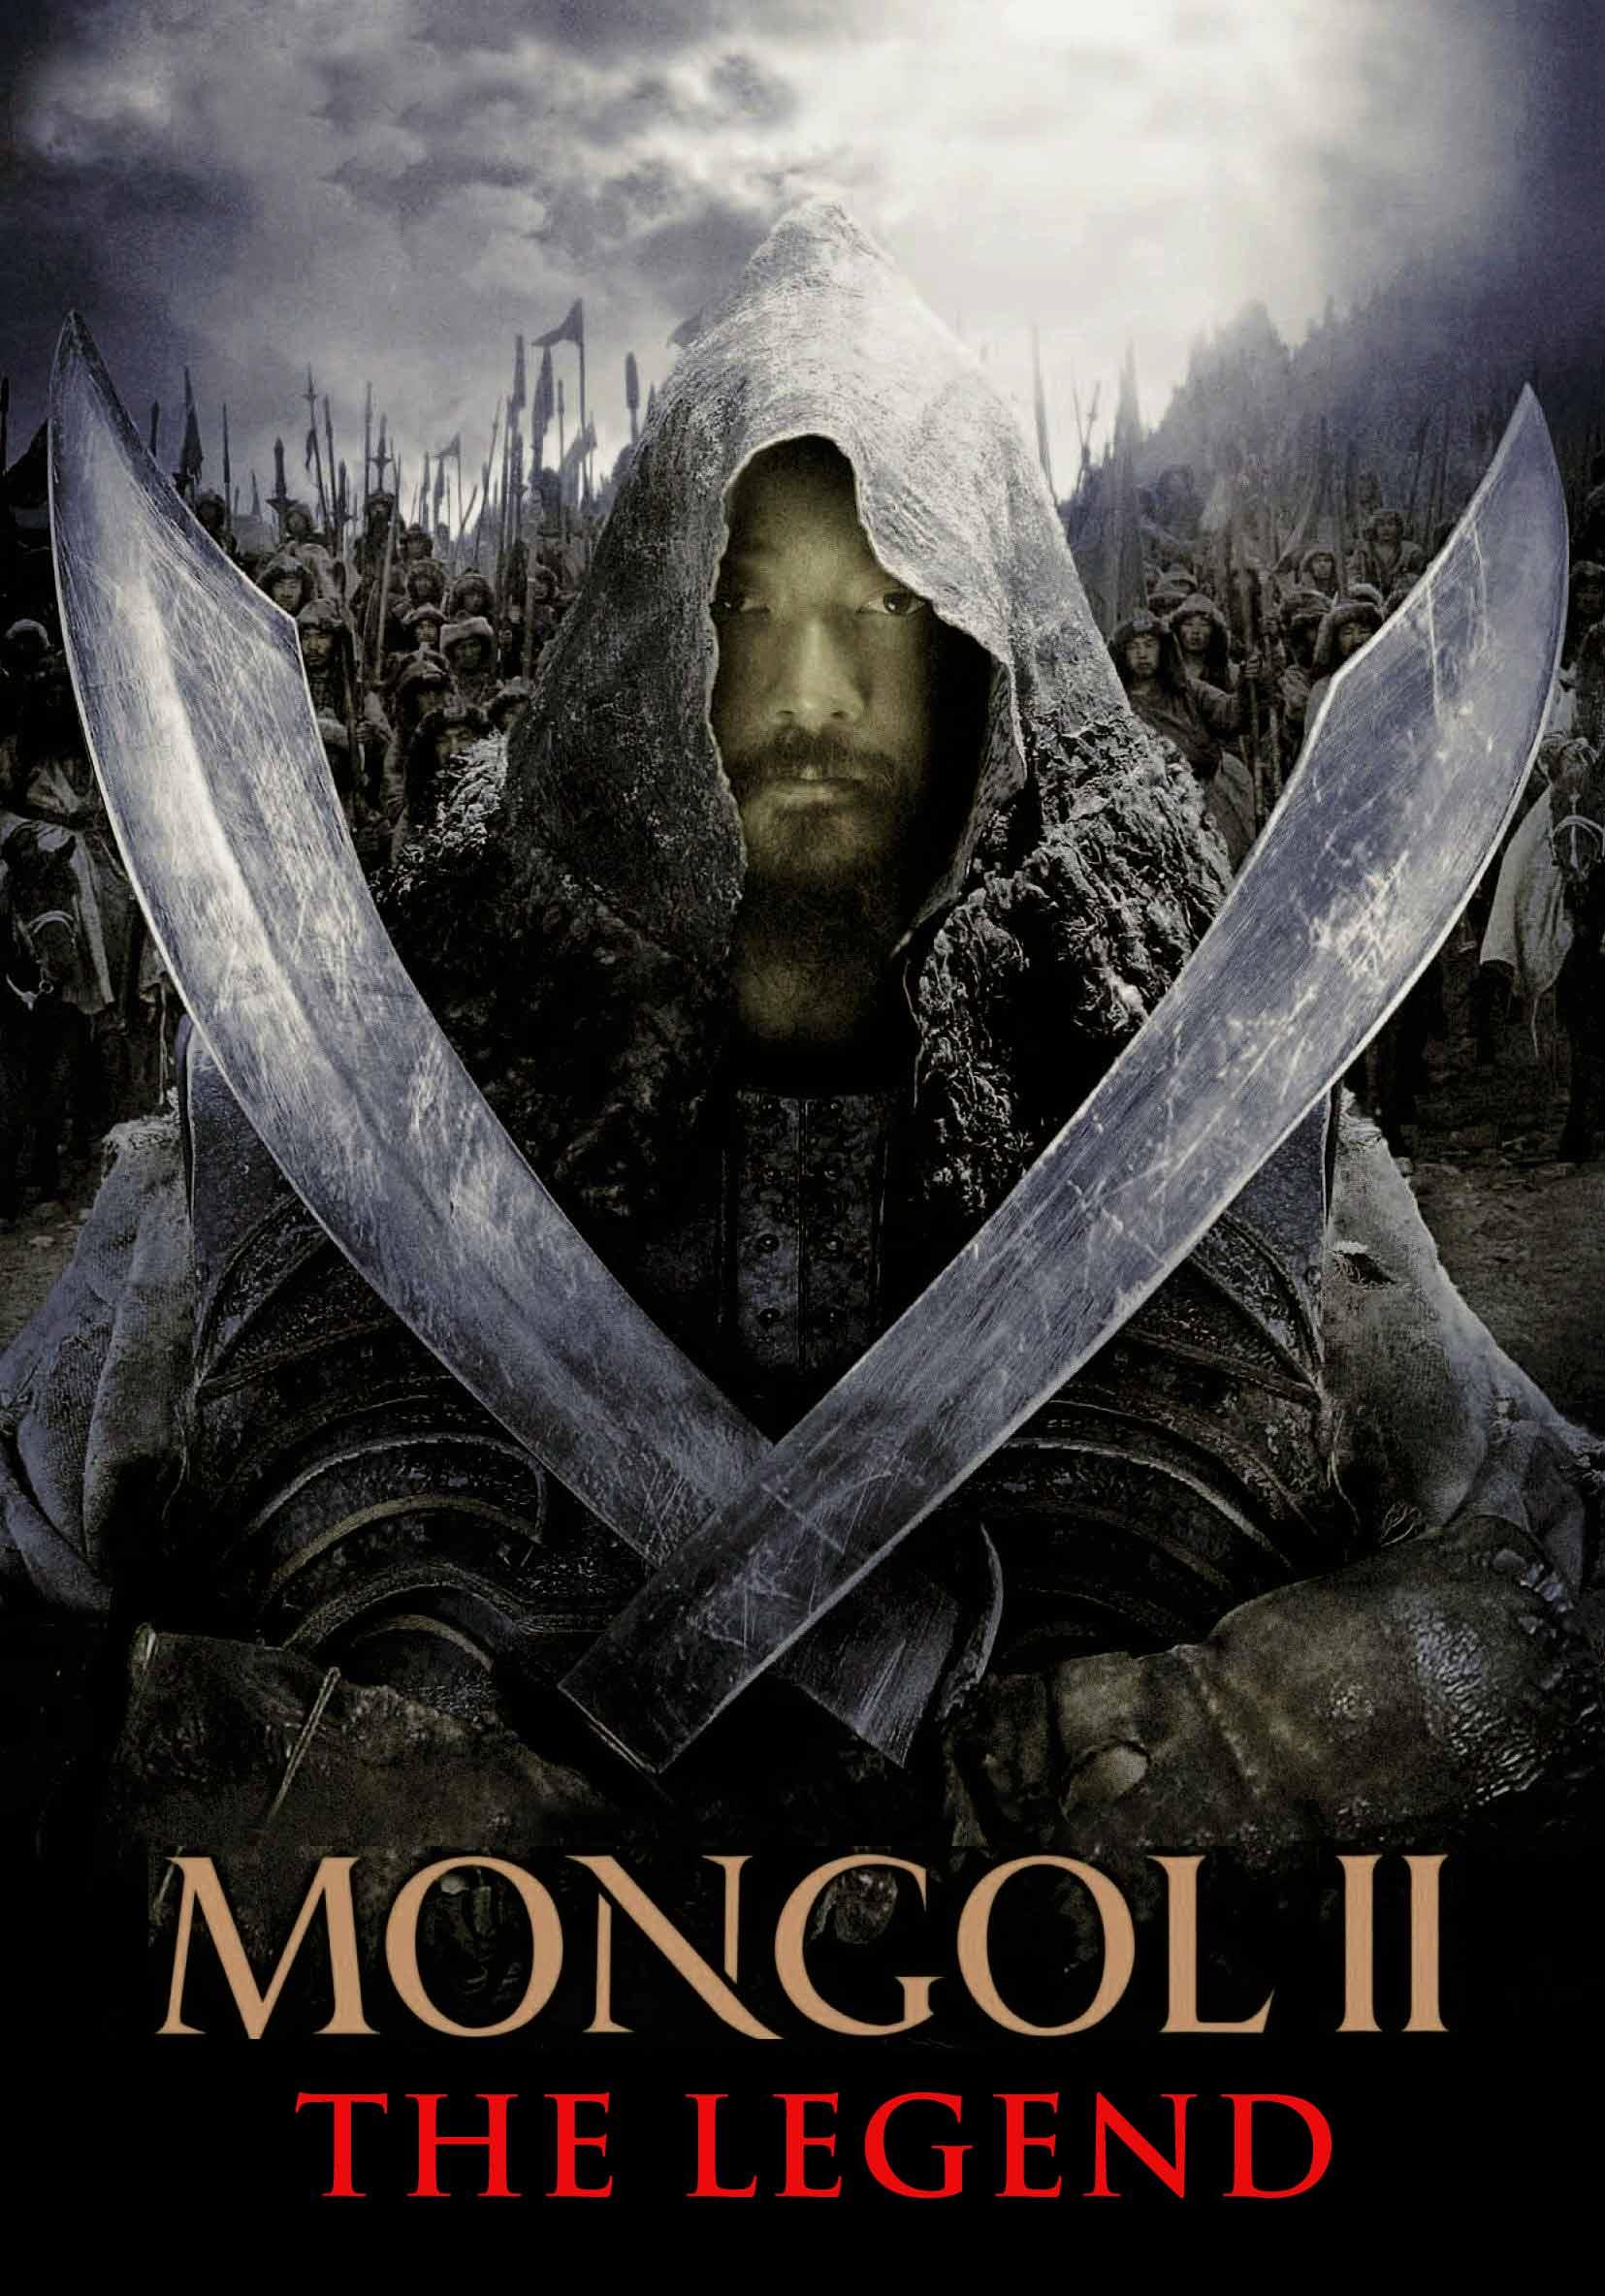 mongol-2-sell-sheet.jpg